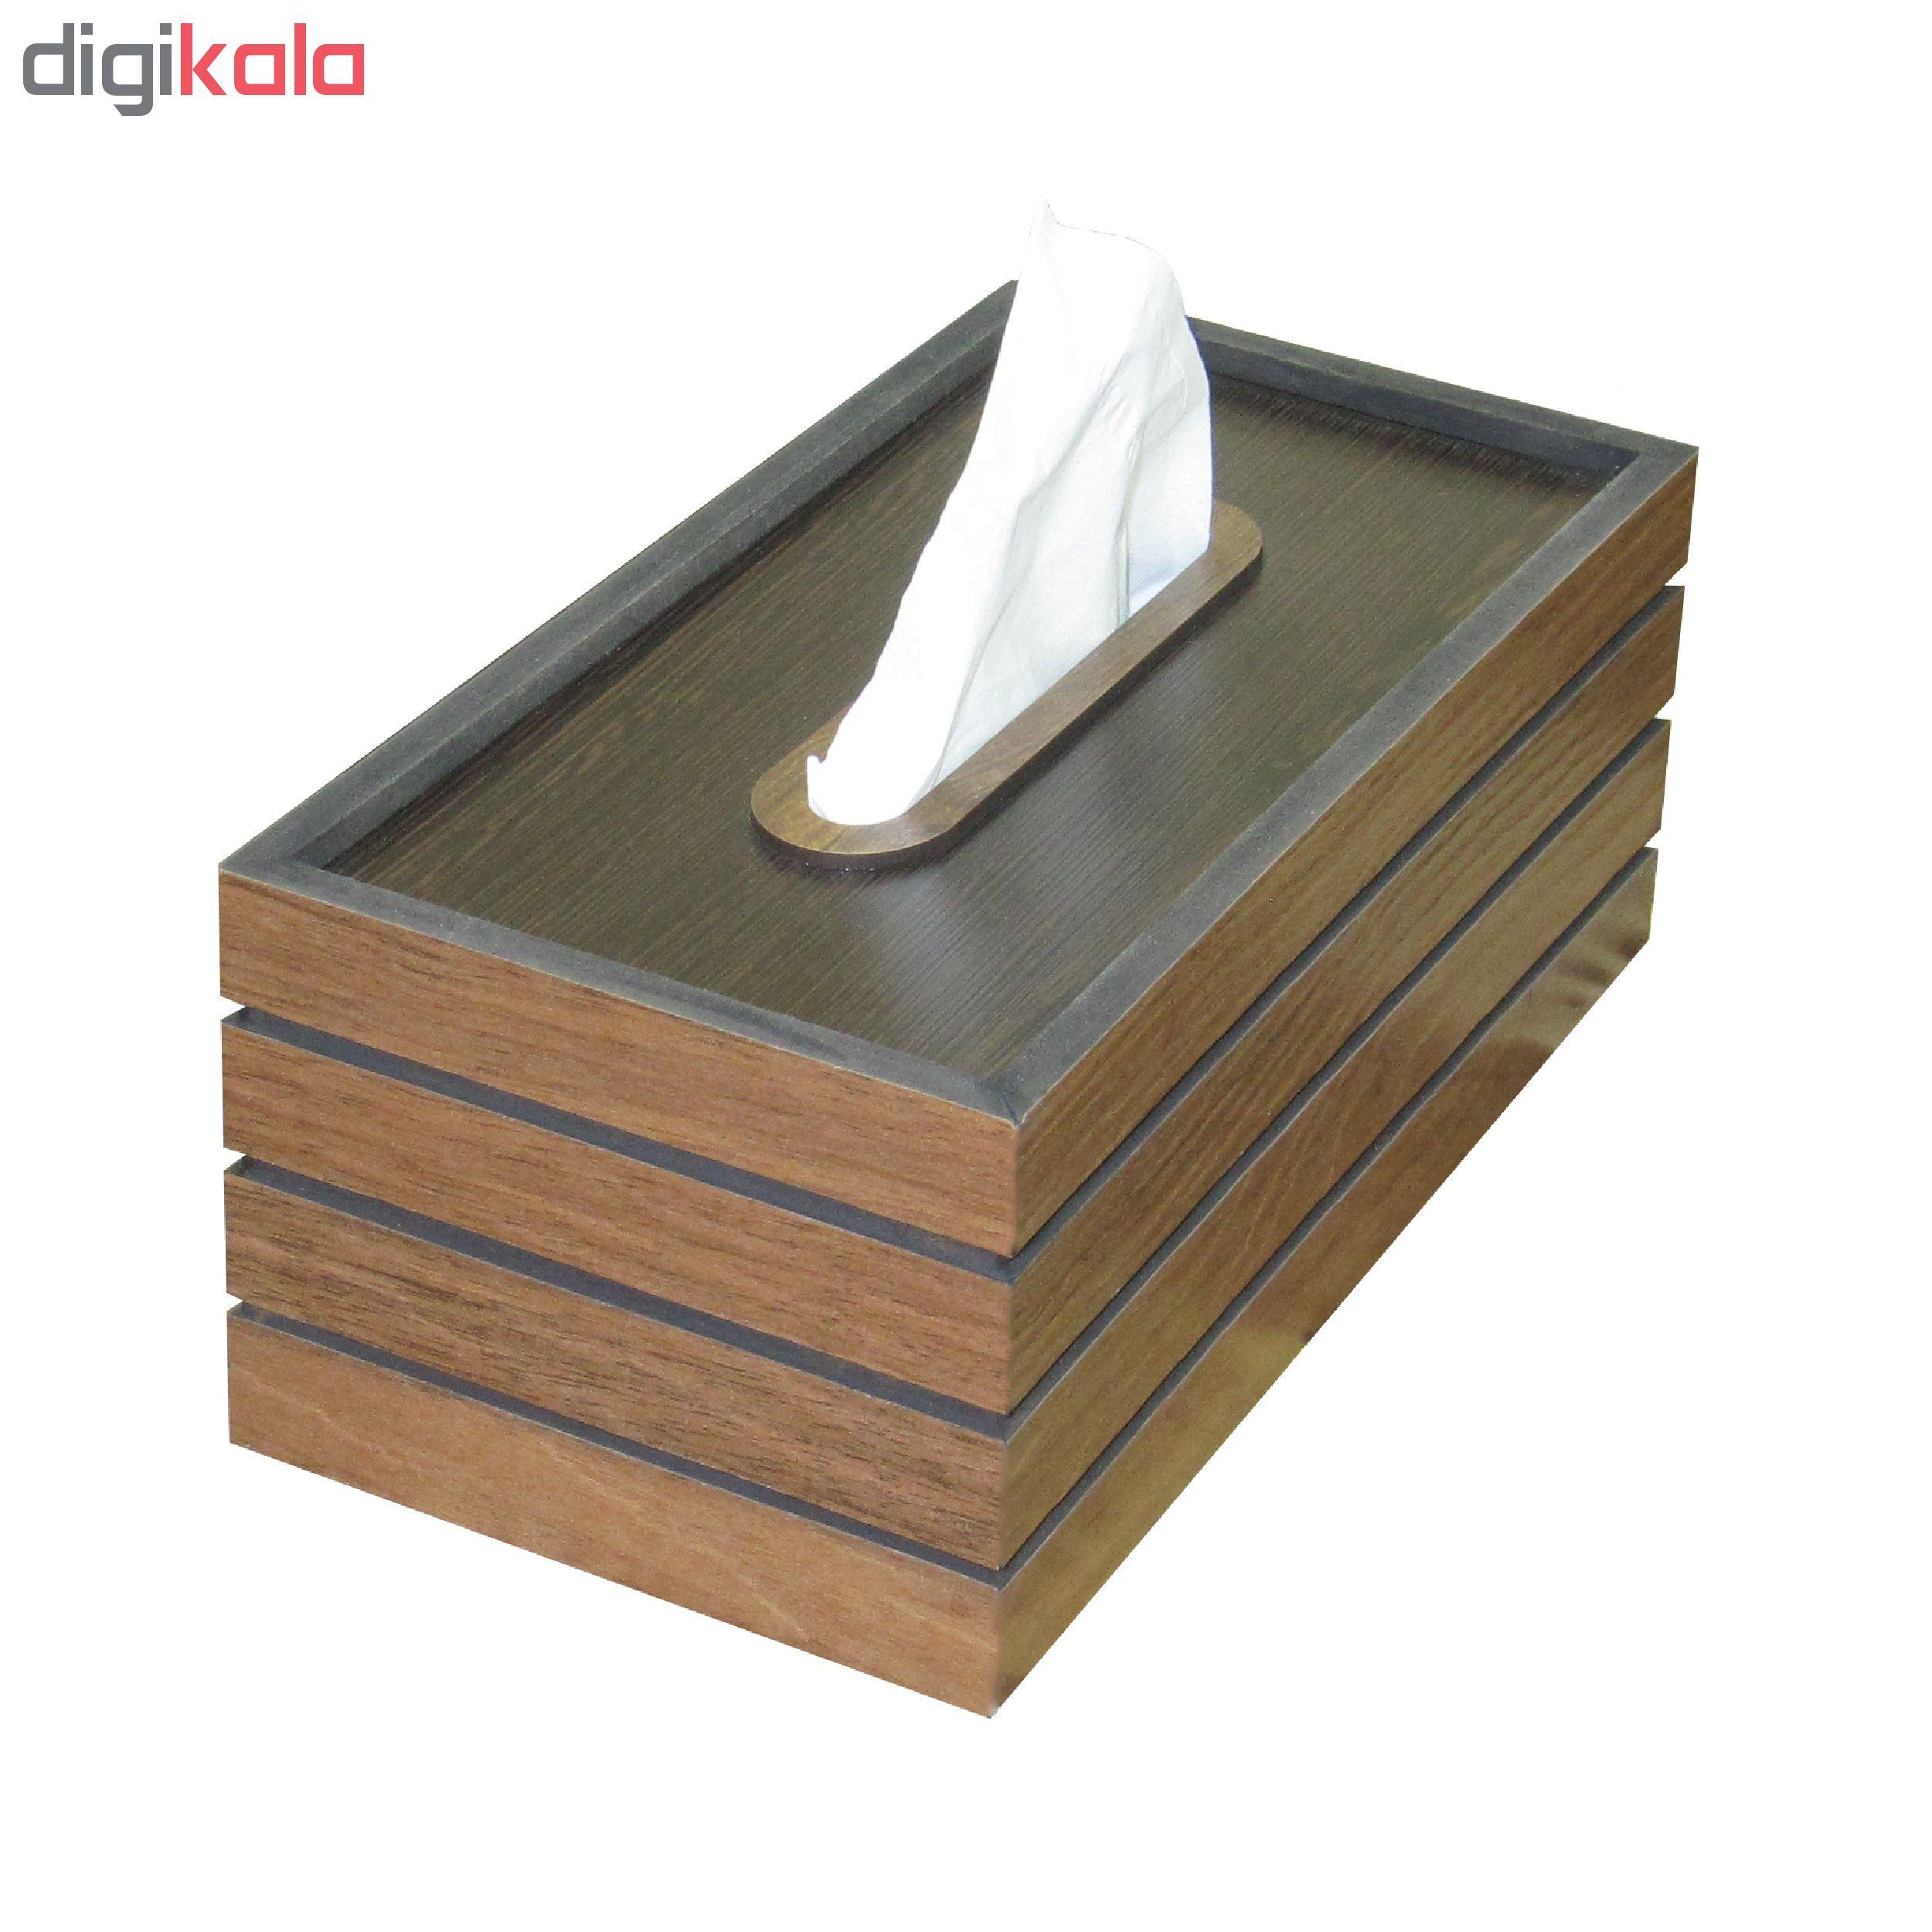 جعبه دستمال کاغذی کد DT-811